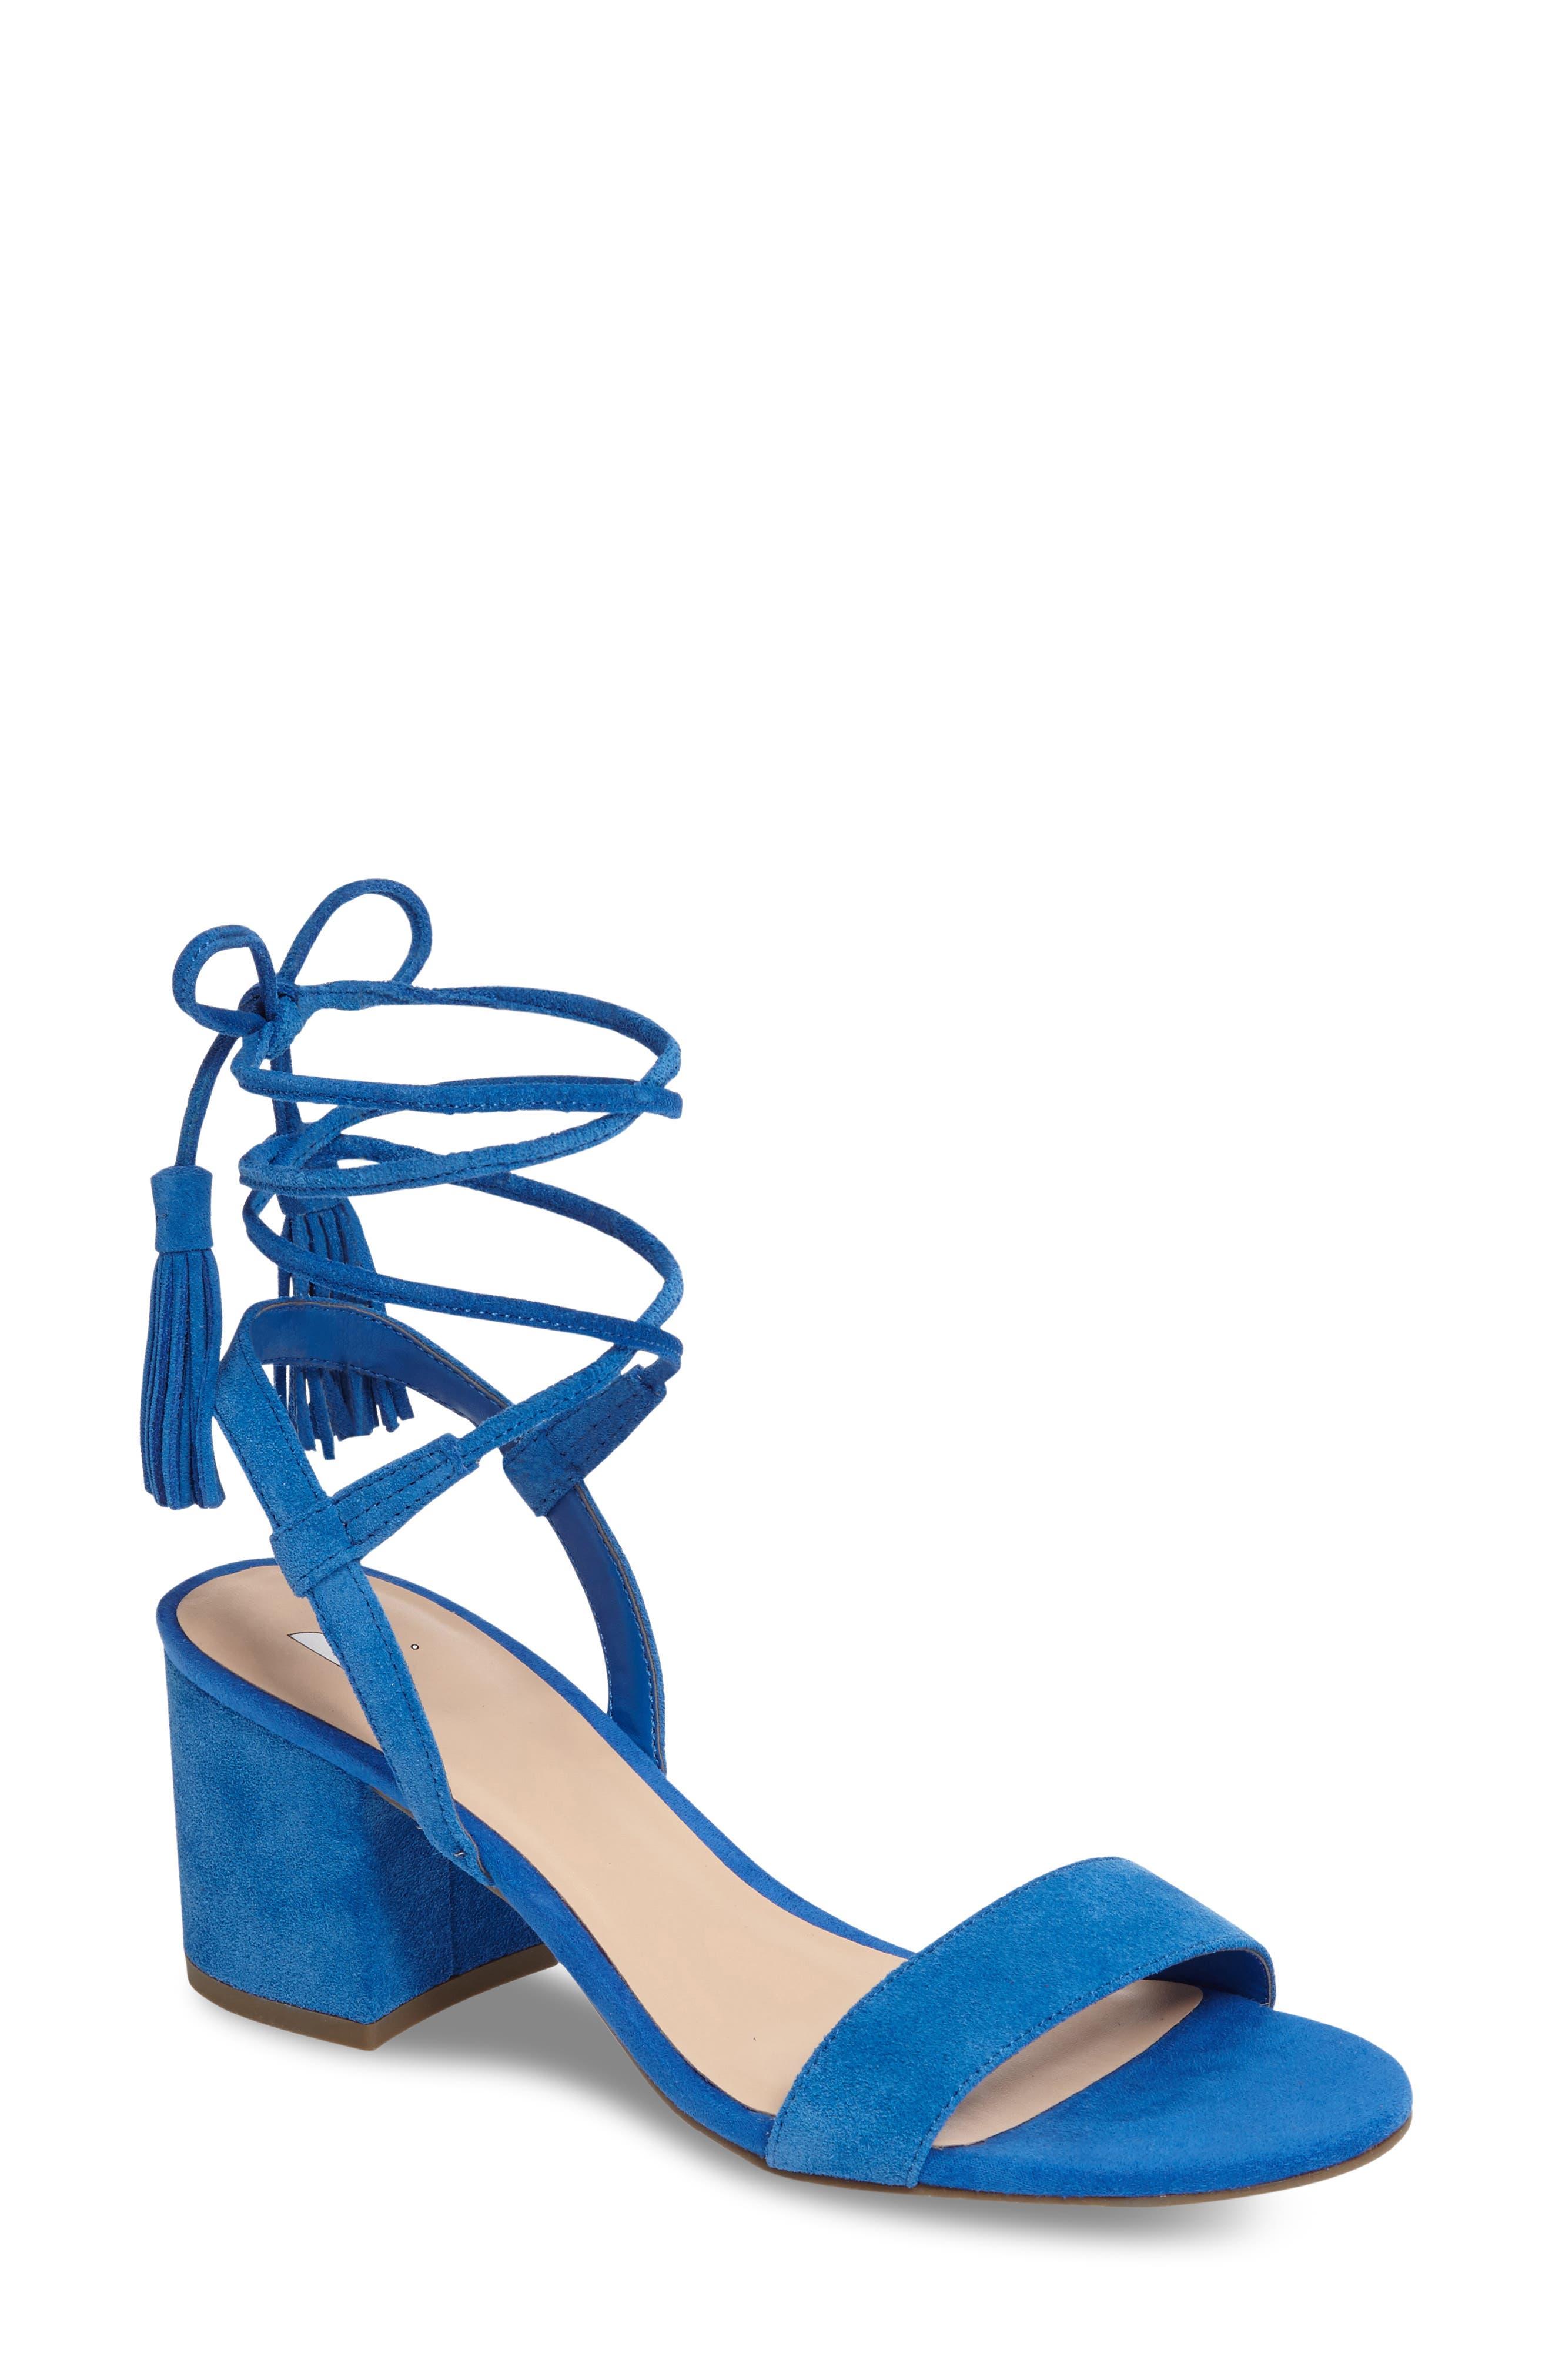 Main Image - BP. Karla Block Heel Ankle Wrap Sandal (Women)